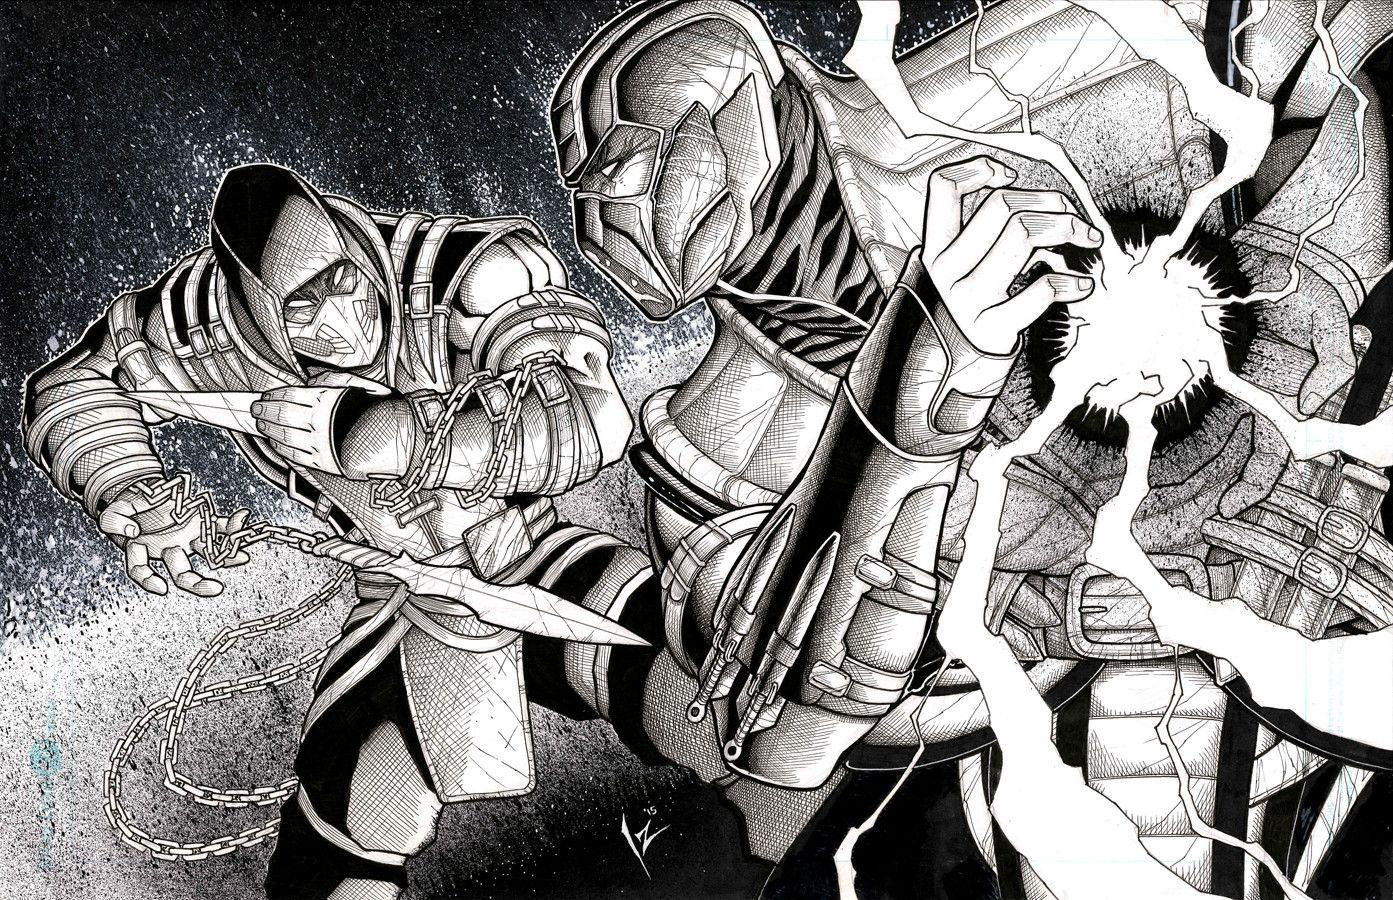 MKX Scorpion vs Sub Zero, Izik Bell on ArtStation at https